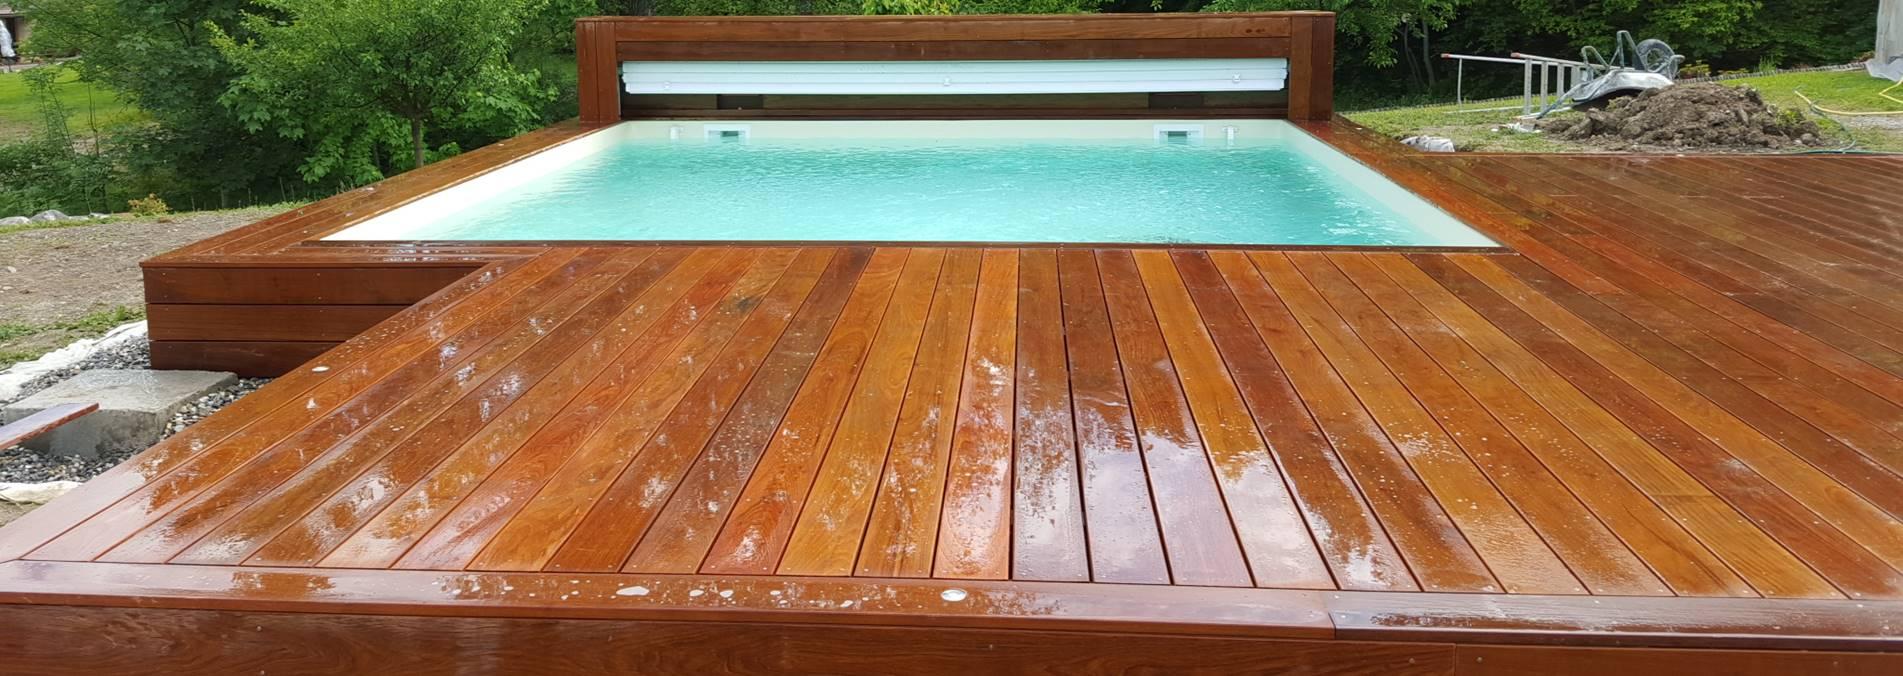 Terrasse en bois exotique ma terrasse en bois for Piscine bois exotique